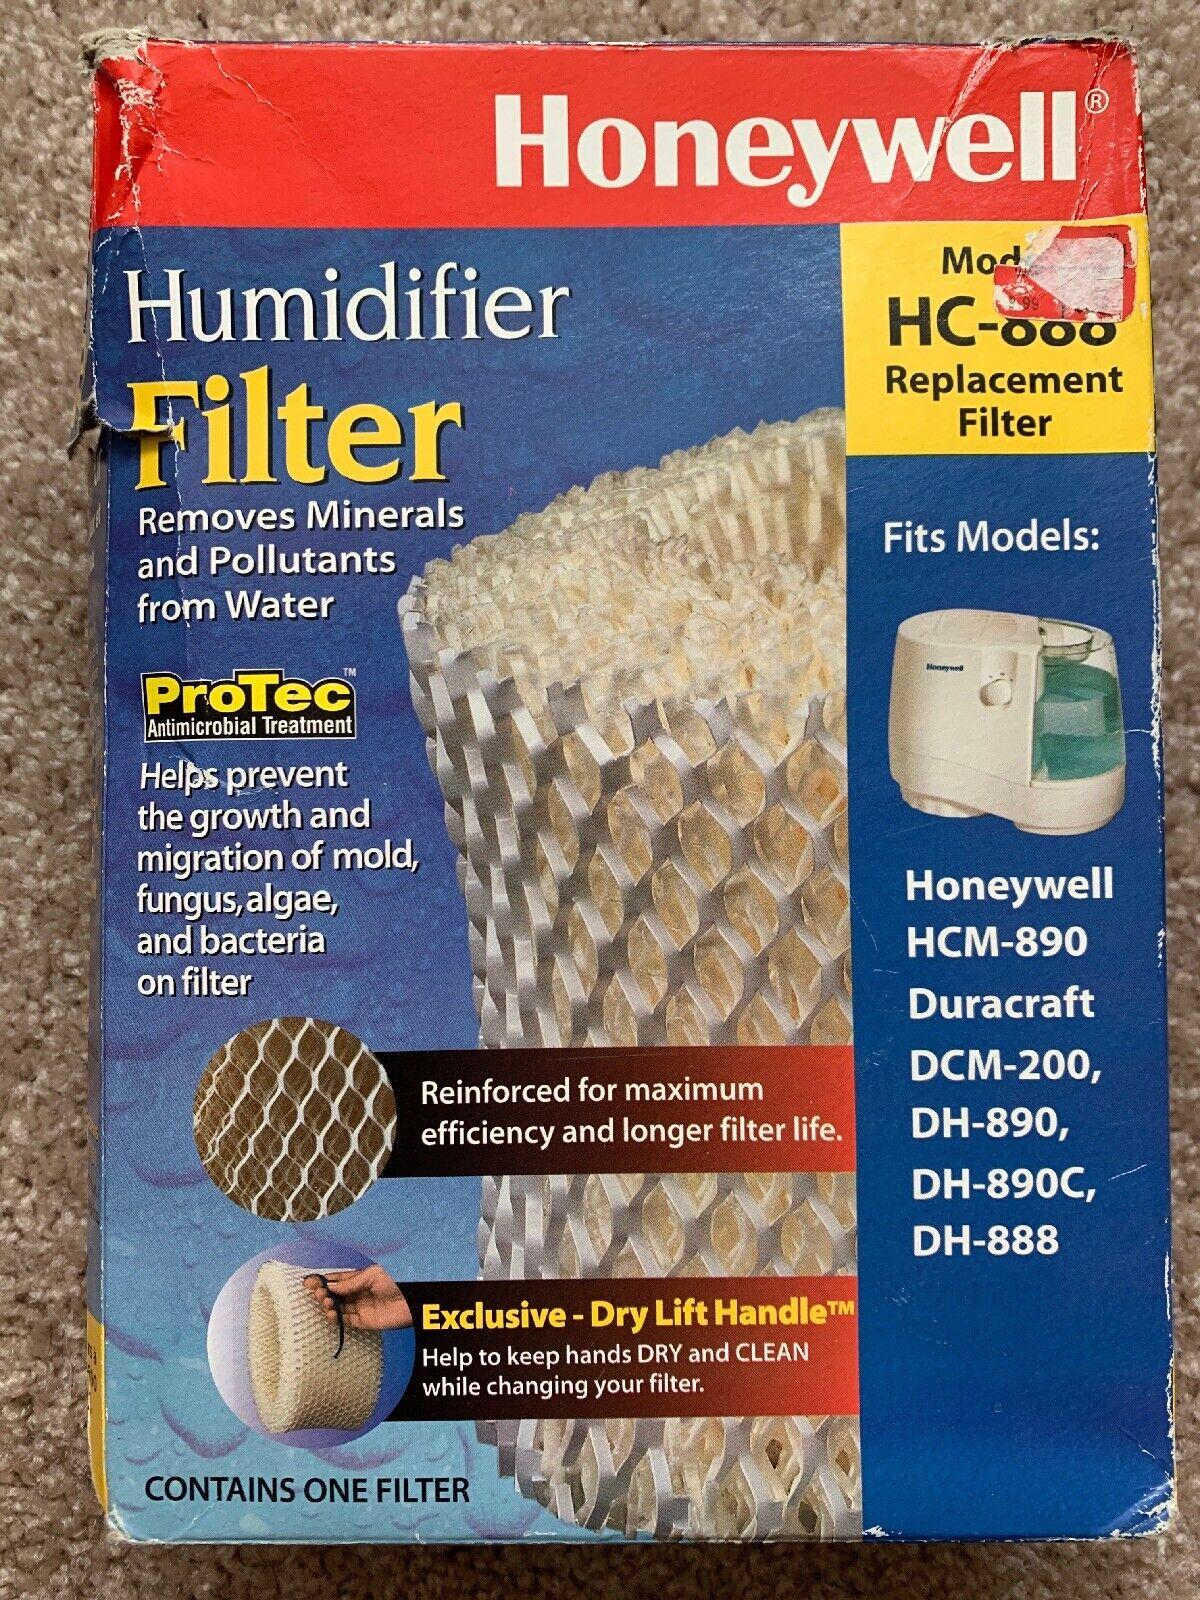 HONEYWELL HC 888 HUMIDIFIER FILTER, DURACRAFT, GENUINE, NEW NOS